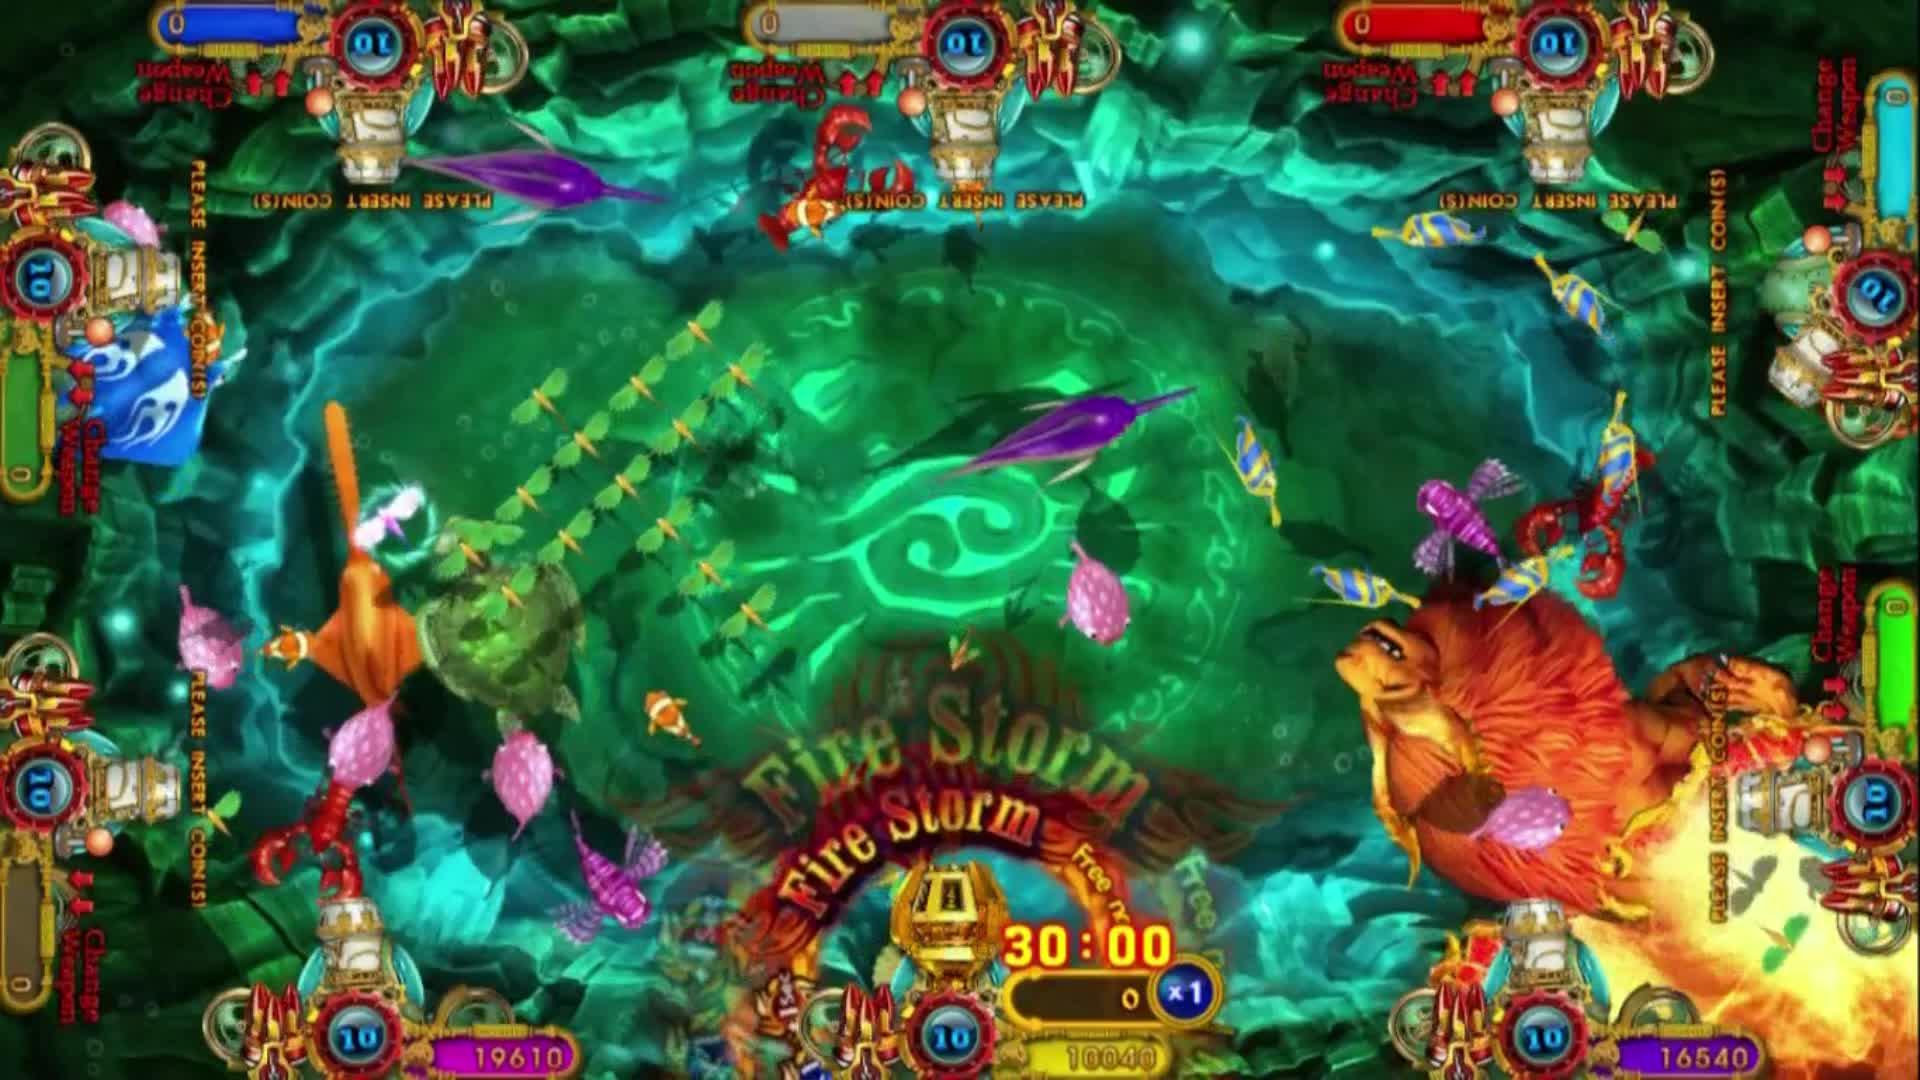 IGS मछली खेल मशीन ताइवान igs मोचन खेल बिक्री के लिए मछली खेल टेबल जुआ मशीनों